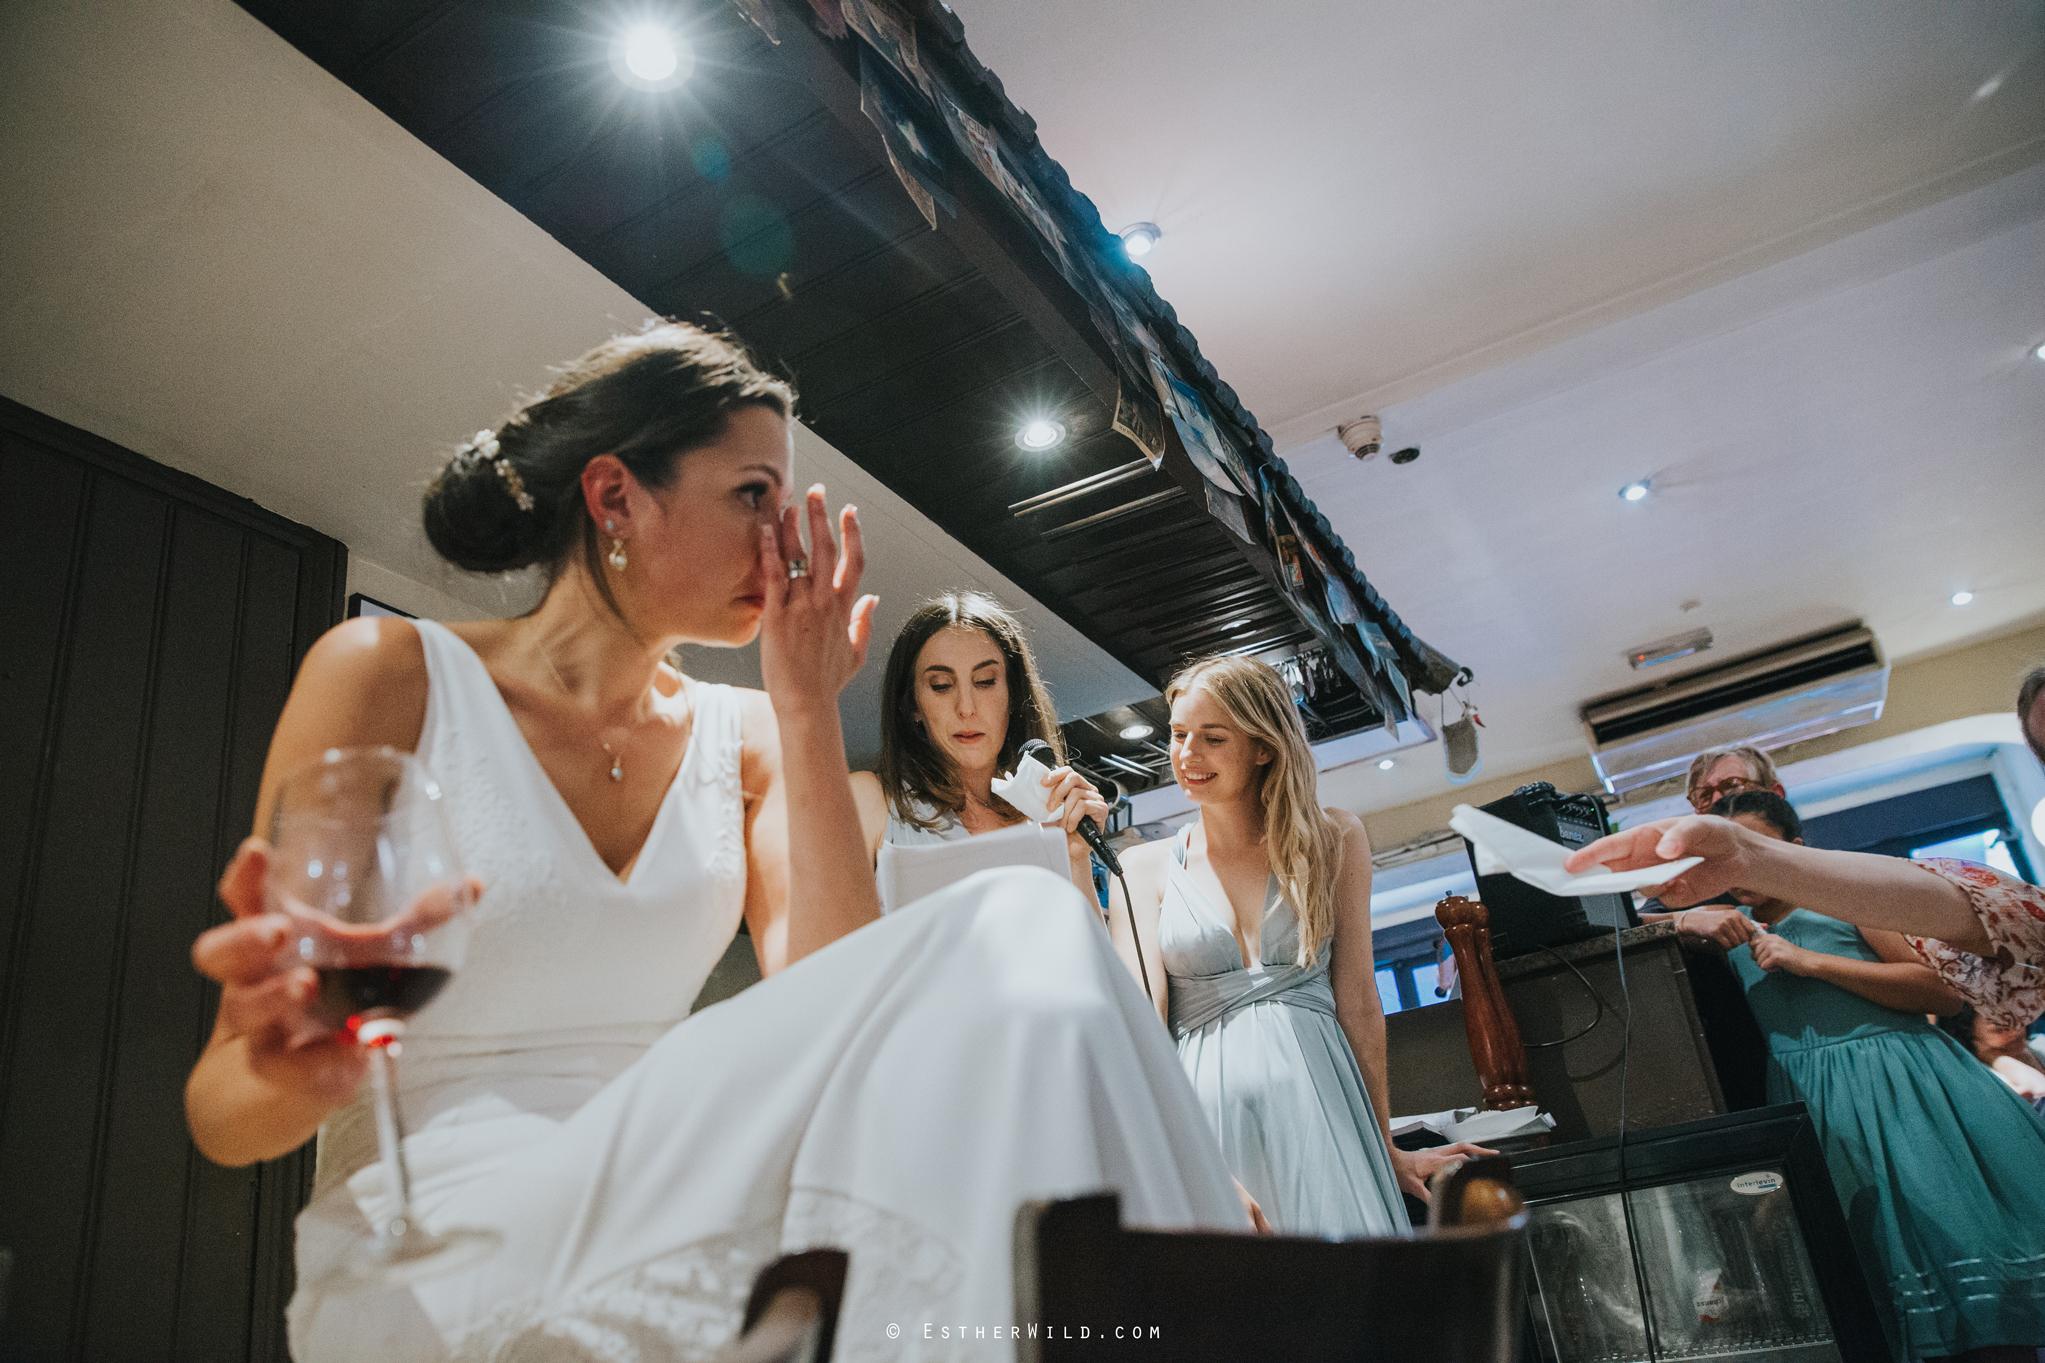 0917_London_Camden_Islington_Bus_Vintage_Wedding_Esther_Wild_IMG_6068.jpg